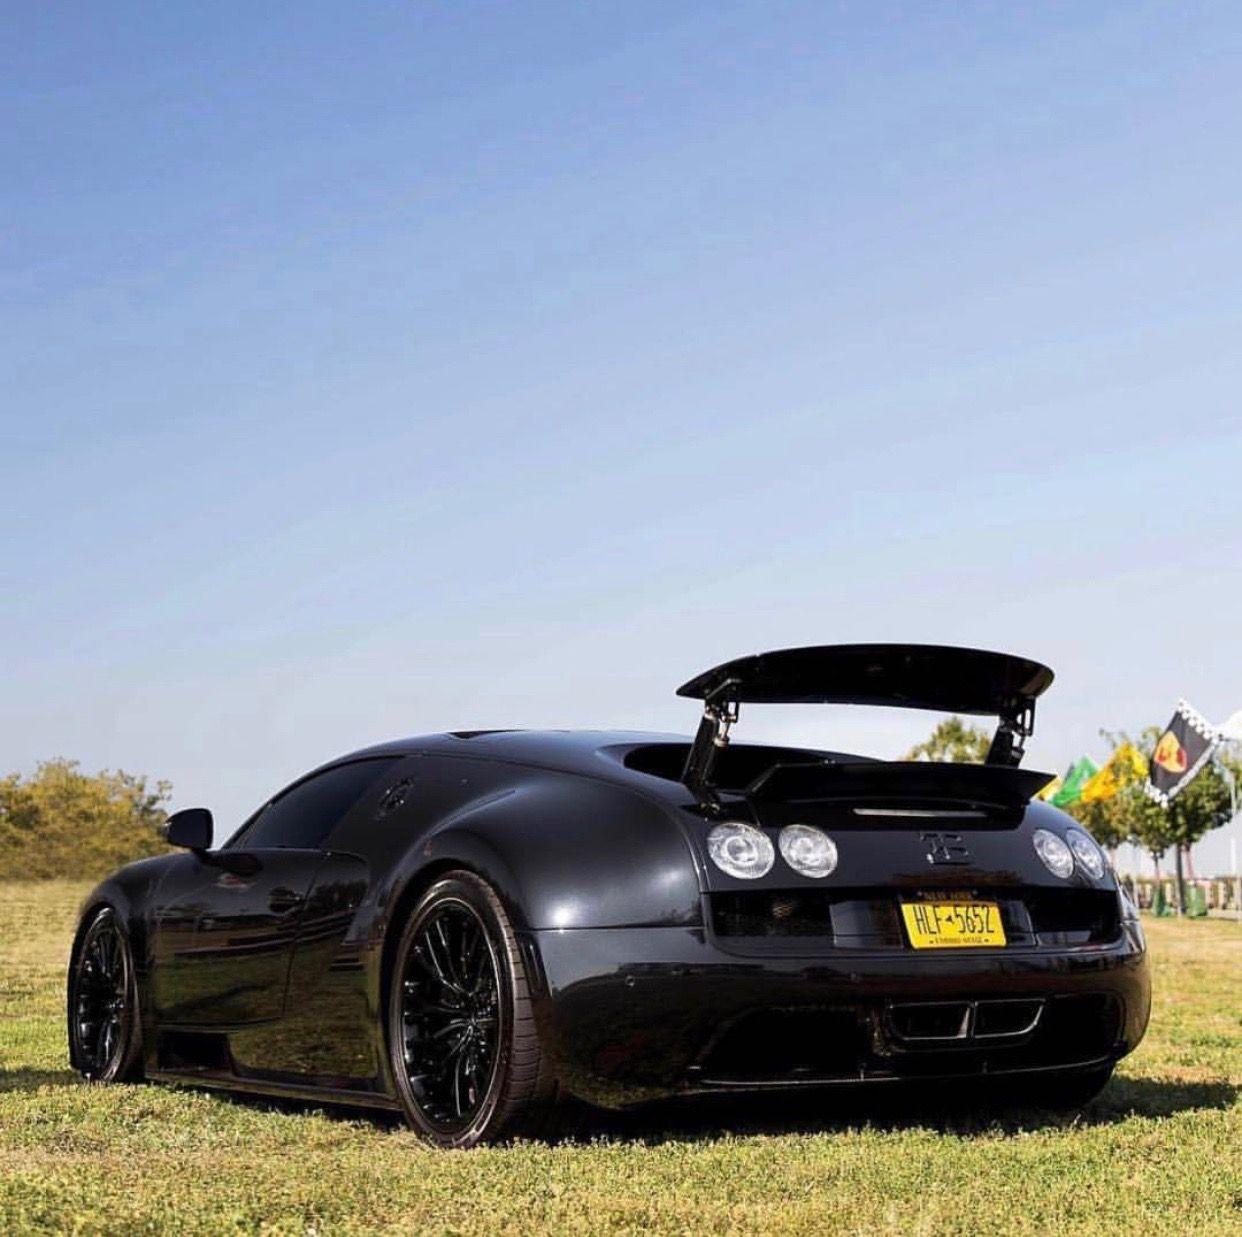 Black Bugatti: Bugatti Veyron Super Sport Made Out Of Black Carbon Fiber